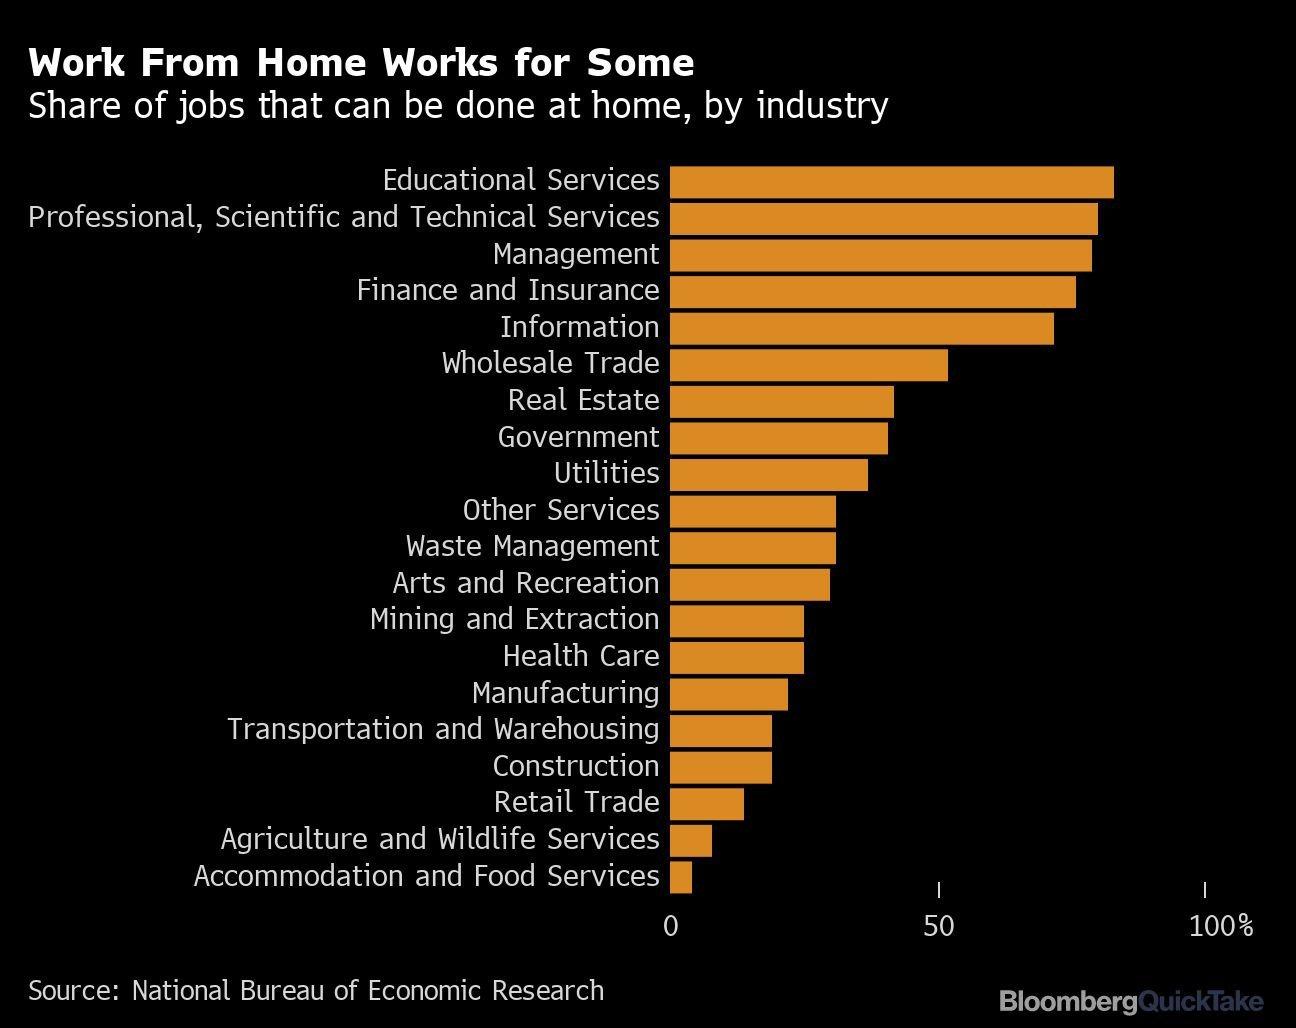 trabalho_home_office_produtividade_bloomberg